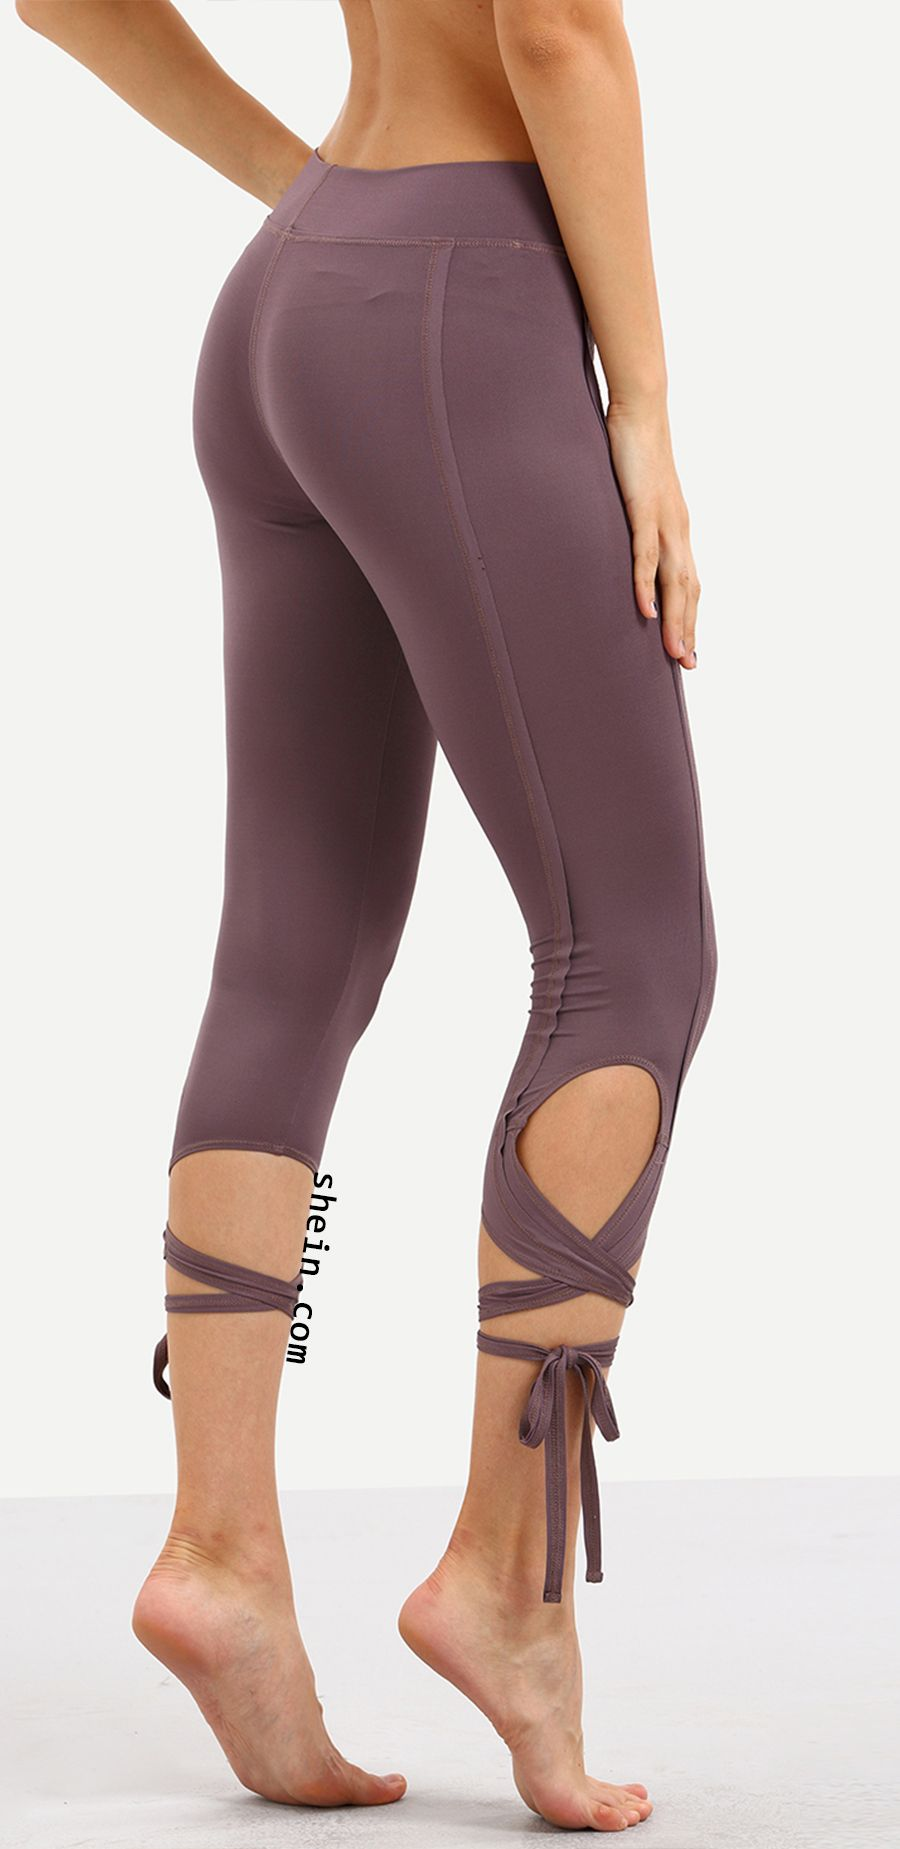 purple hollow tie skinny leggings 9 9 at spotlights pinterest fitness. Black Bedroom Furniture Sets. Home Design Ideas